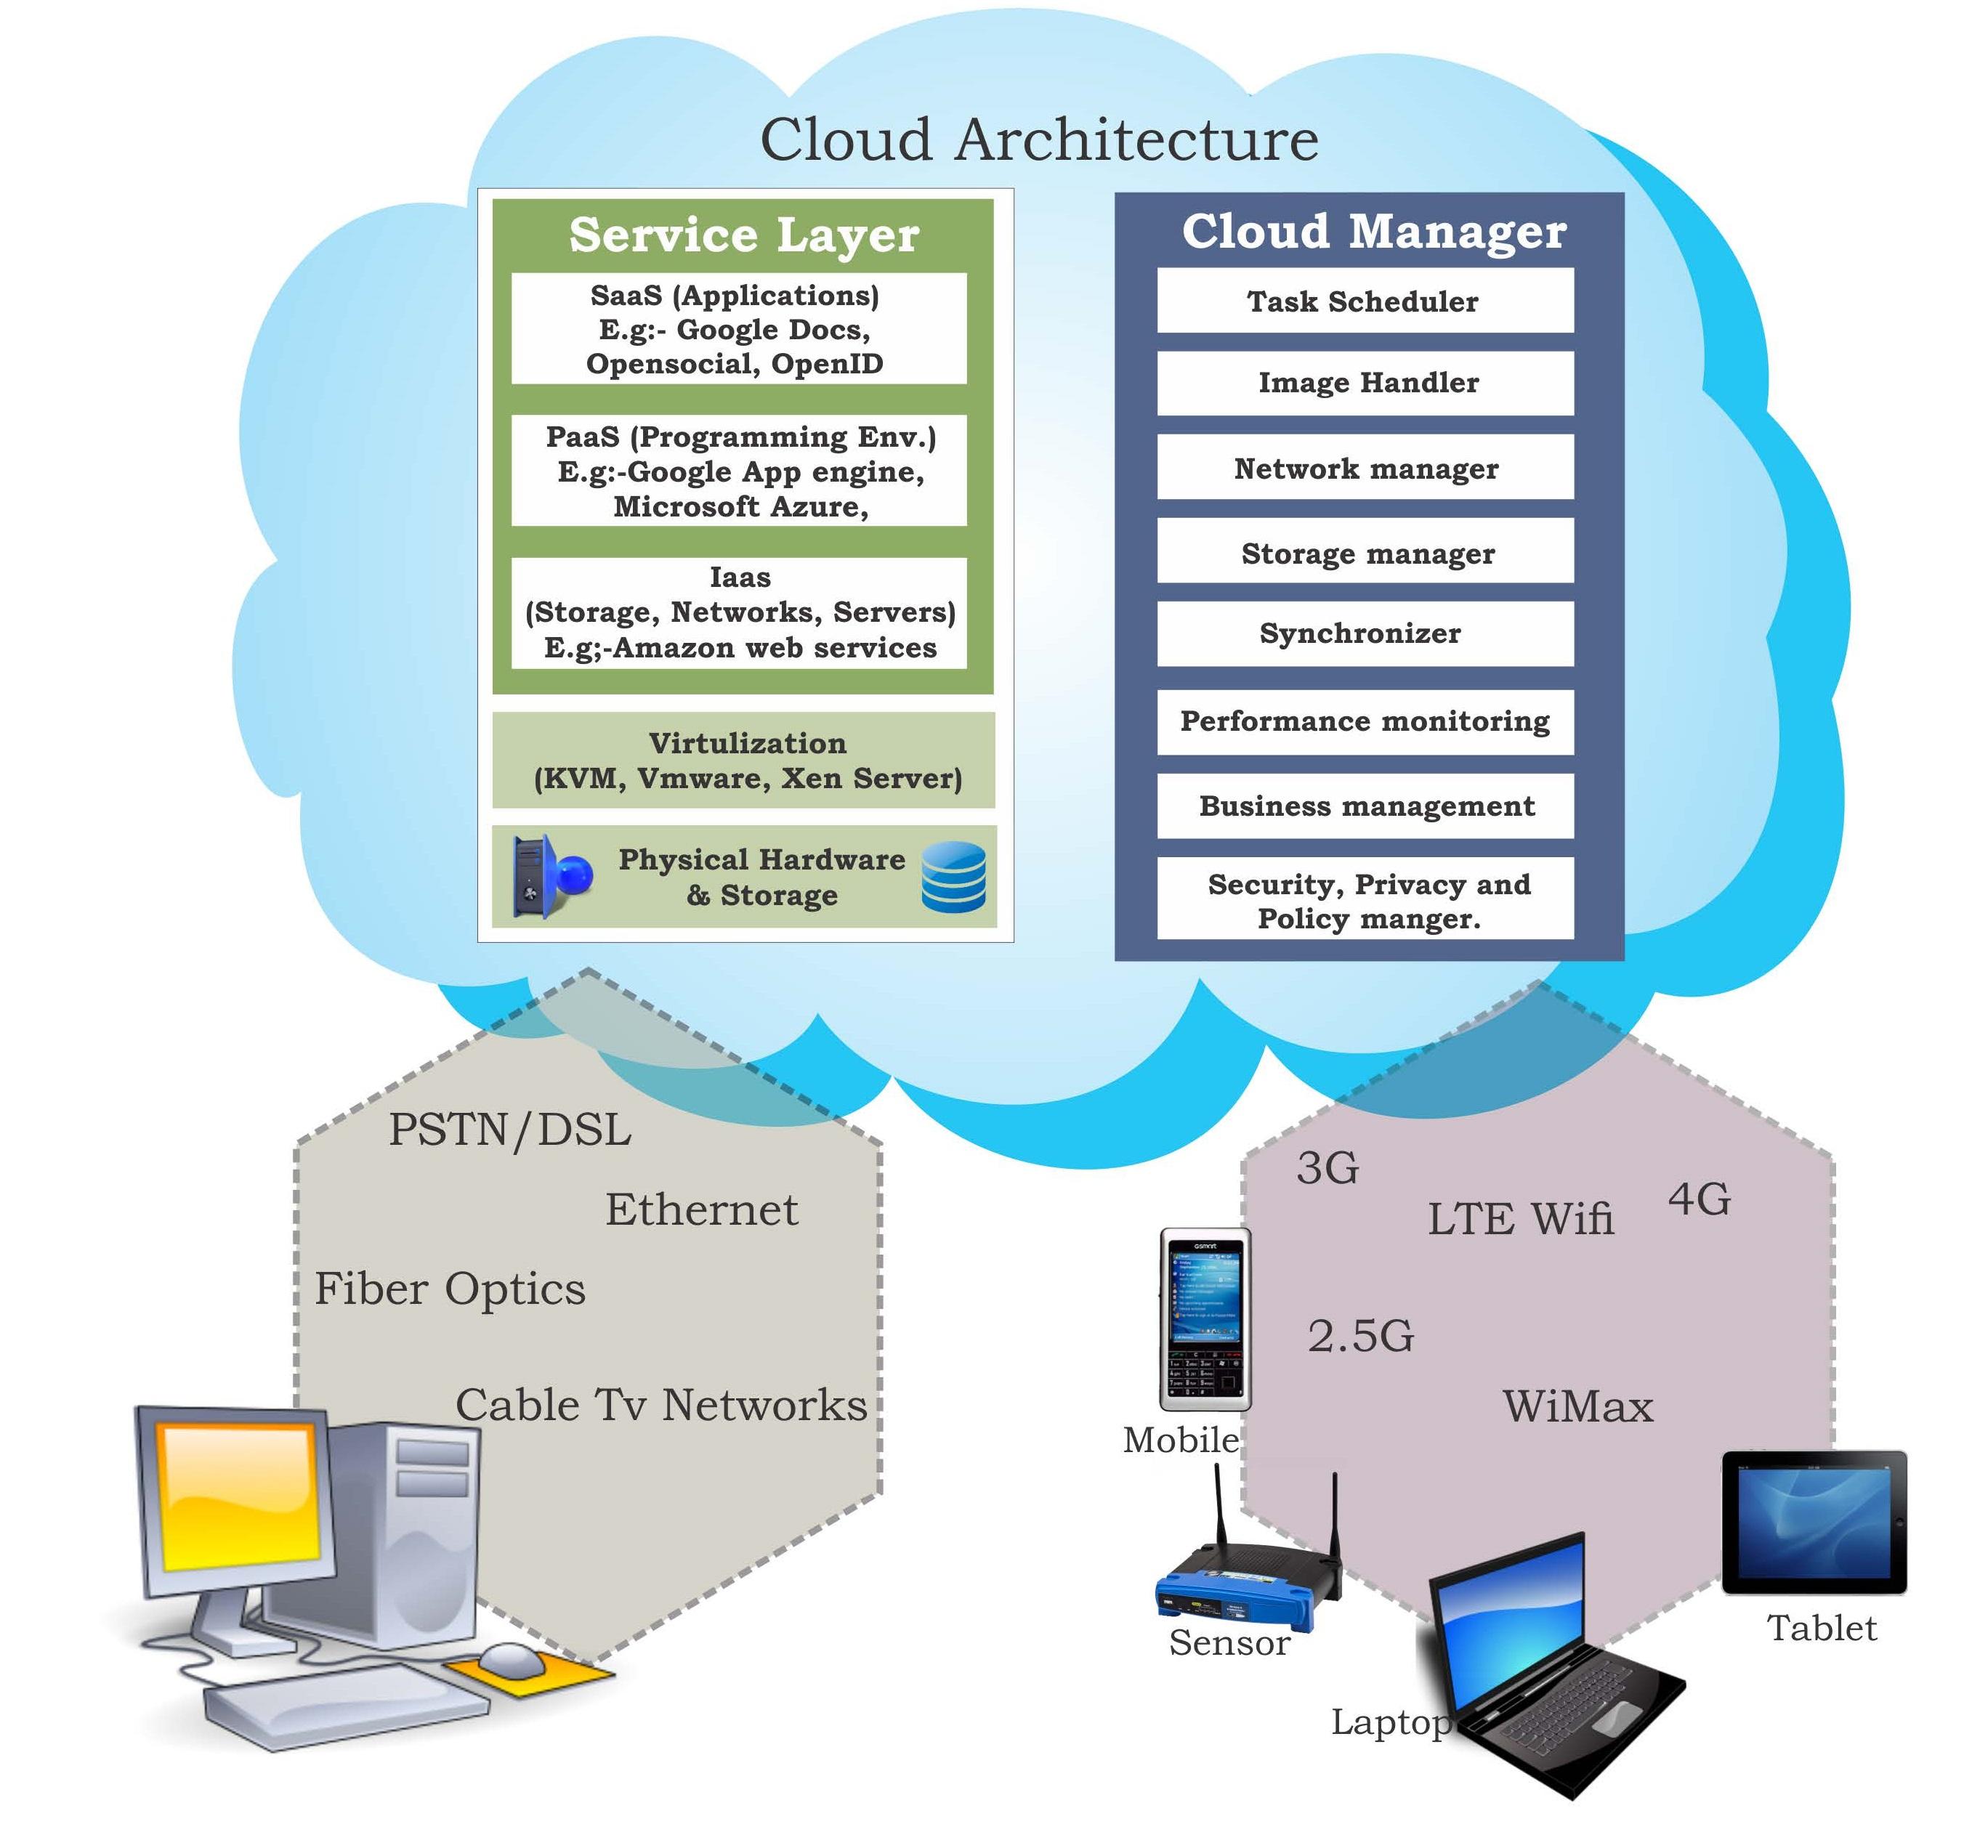 Token-Based Authentication Techniques on Open Source Cloud